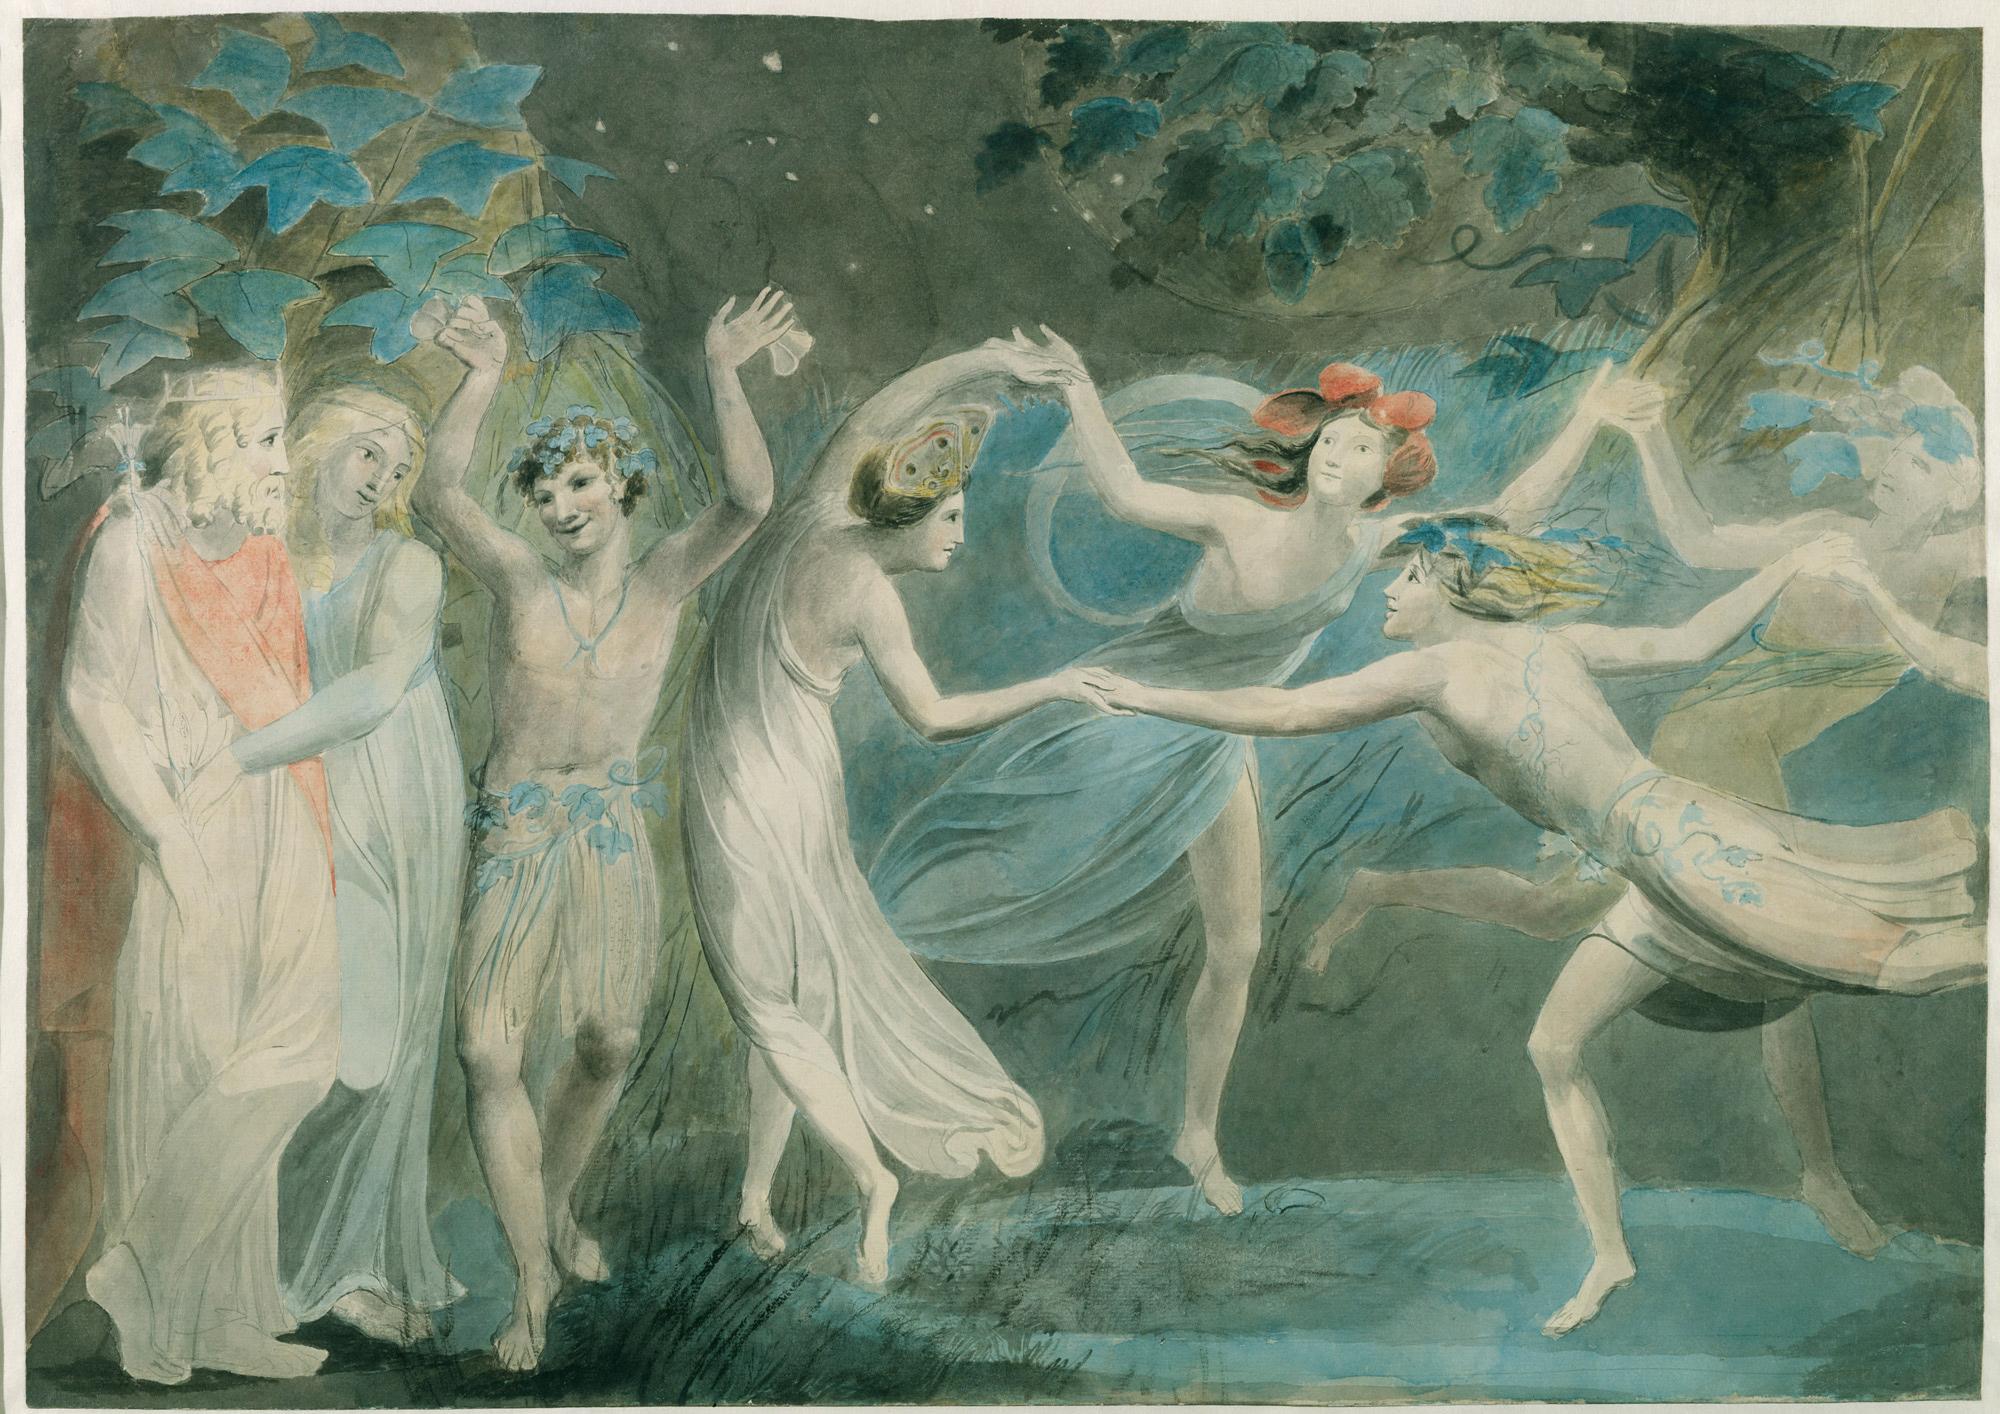 William-Blake-painting-of- Tate-N02686_H.jpg